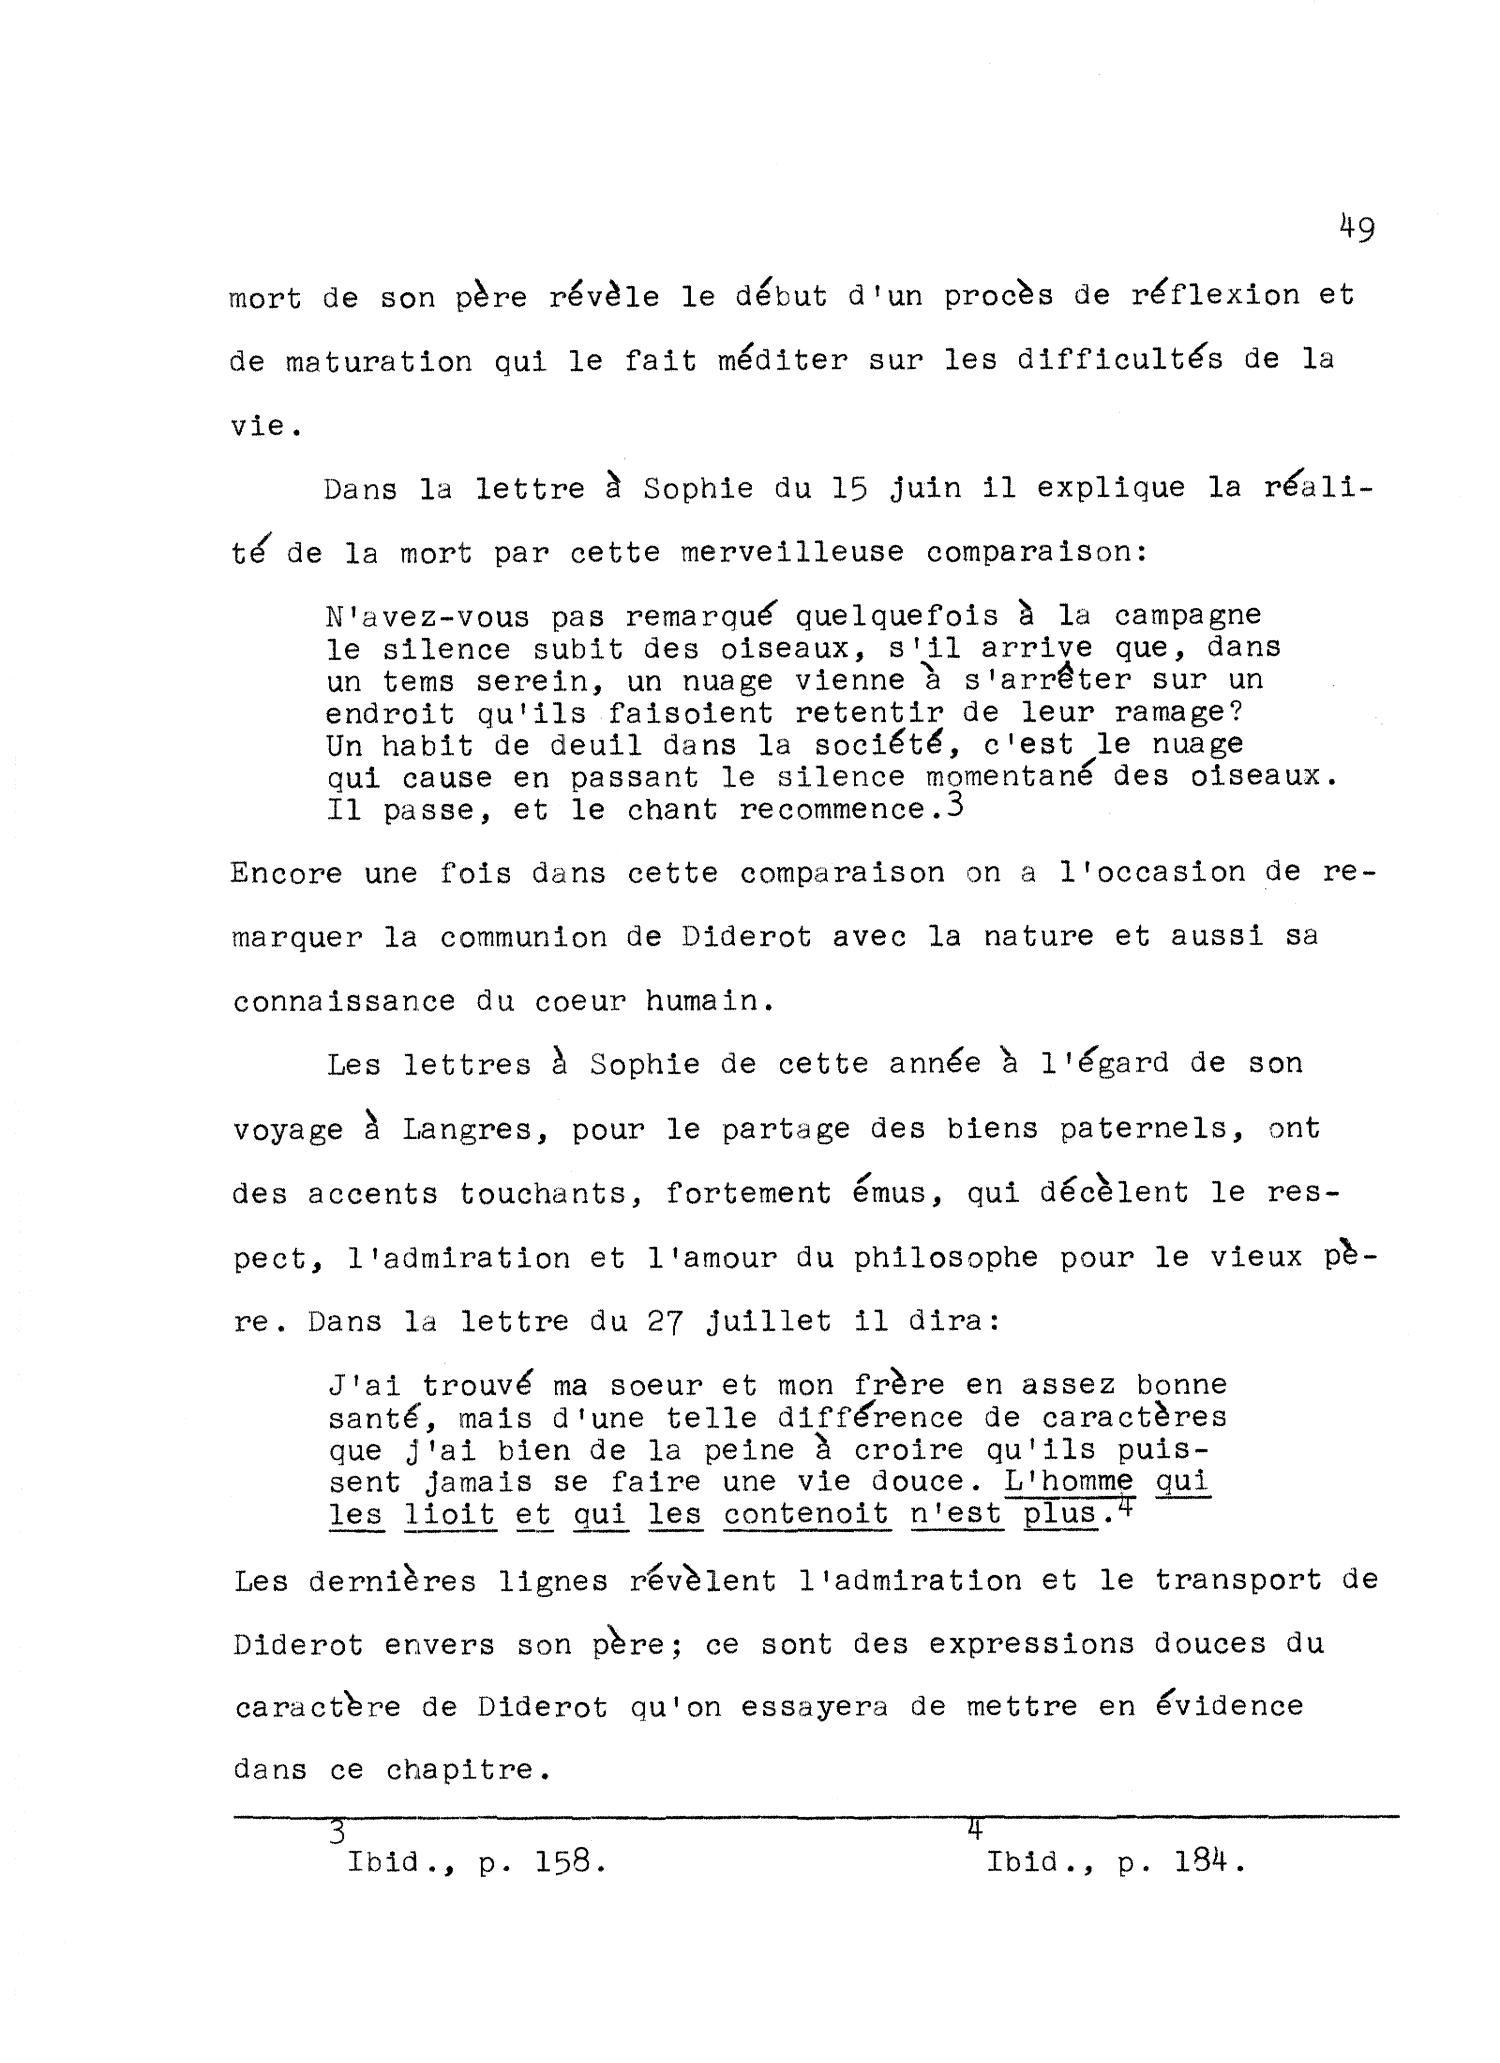 Denis Diderot Lettres à Sophie Volland 1759 Page 49 Unt